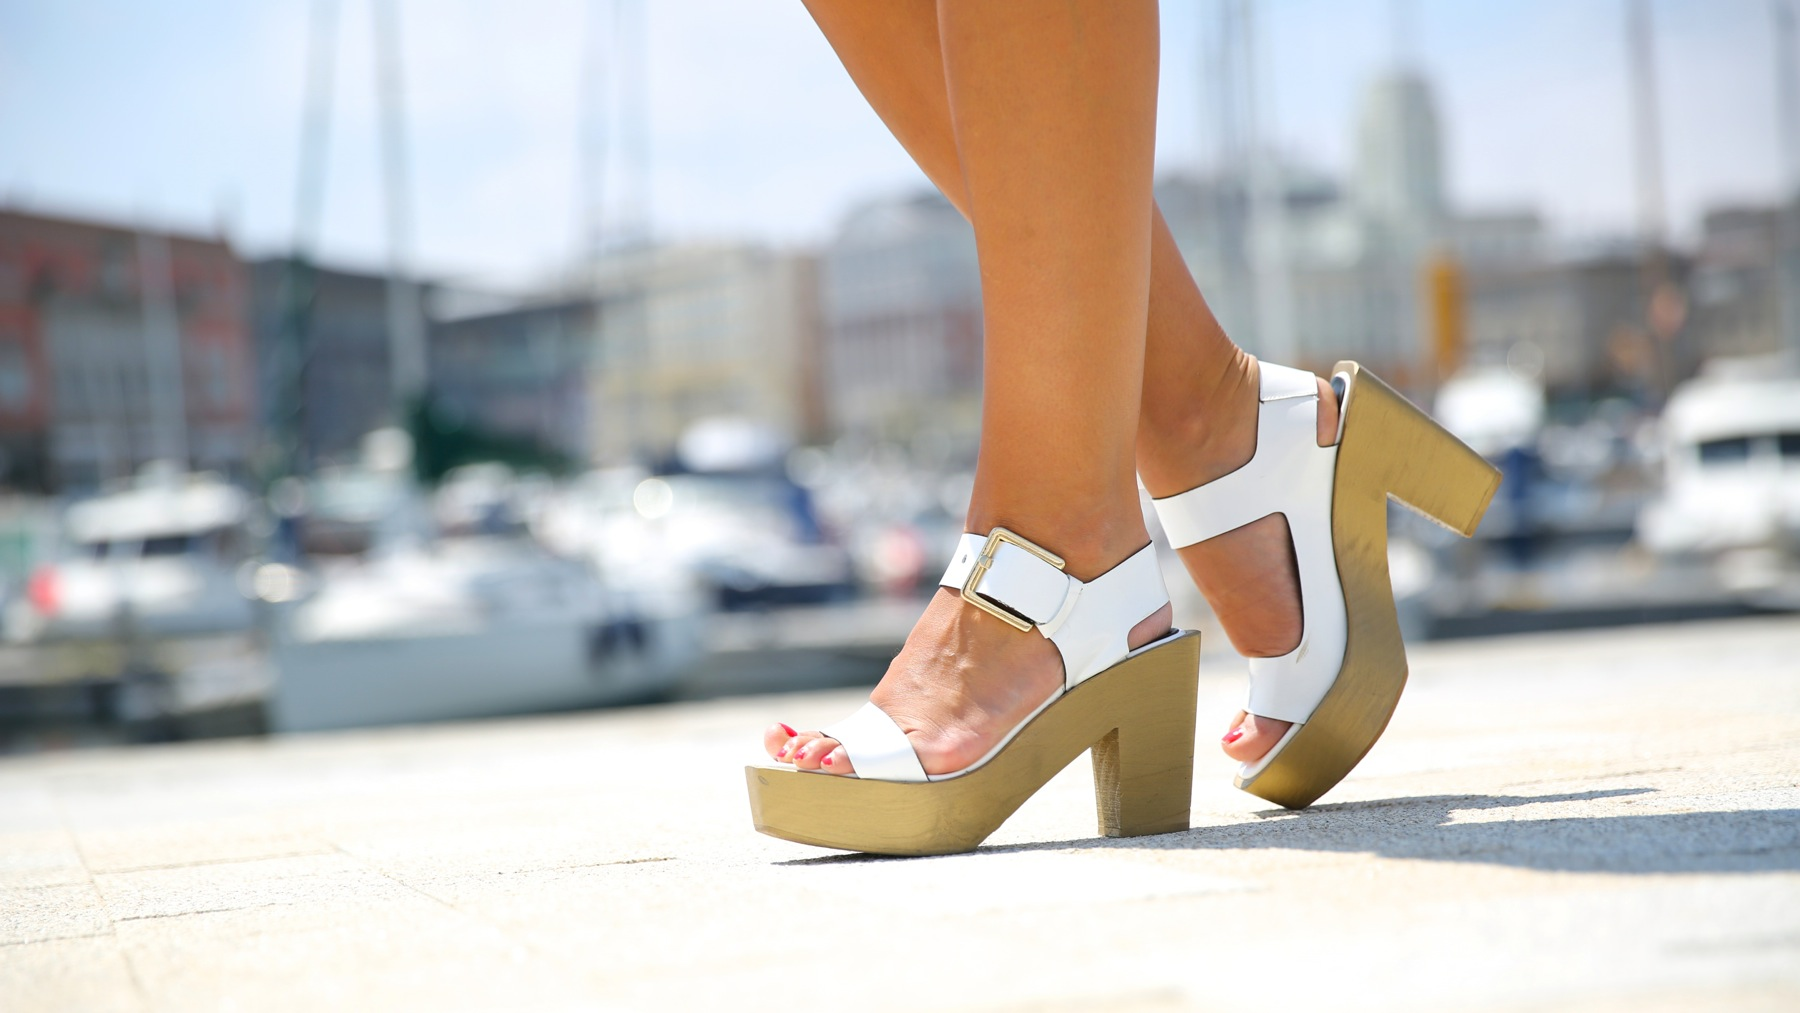 trendy_taste-look-outfit-street_style-ootd-blog-blogger-moda_españa-fashion_spain-coruña-galicia-sandalias_plataforma-platform_sandals-rebecca_minkoff-yellow-amarillo-vestido-dress-plaid-cuadros-1